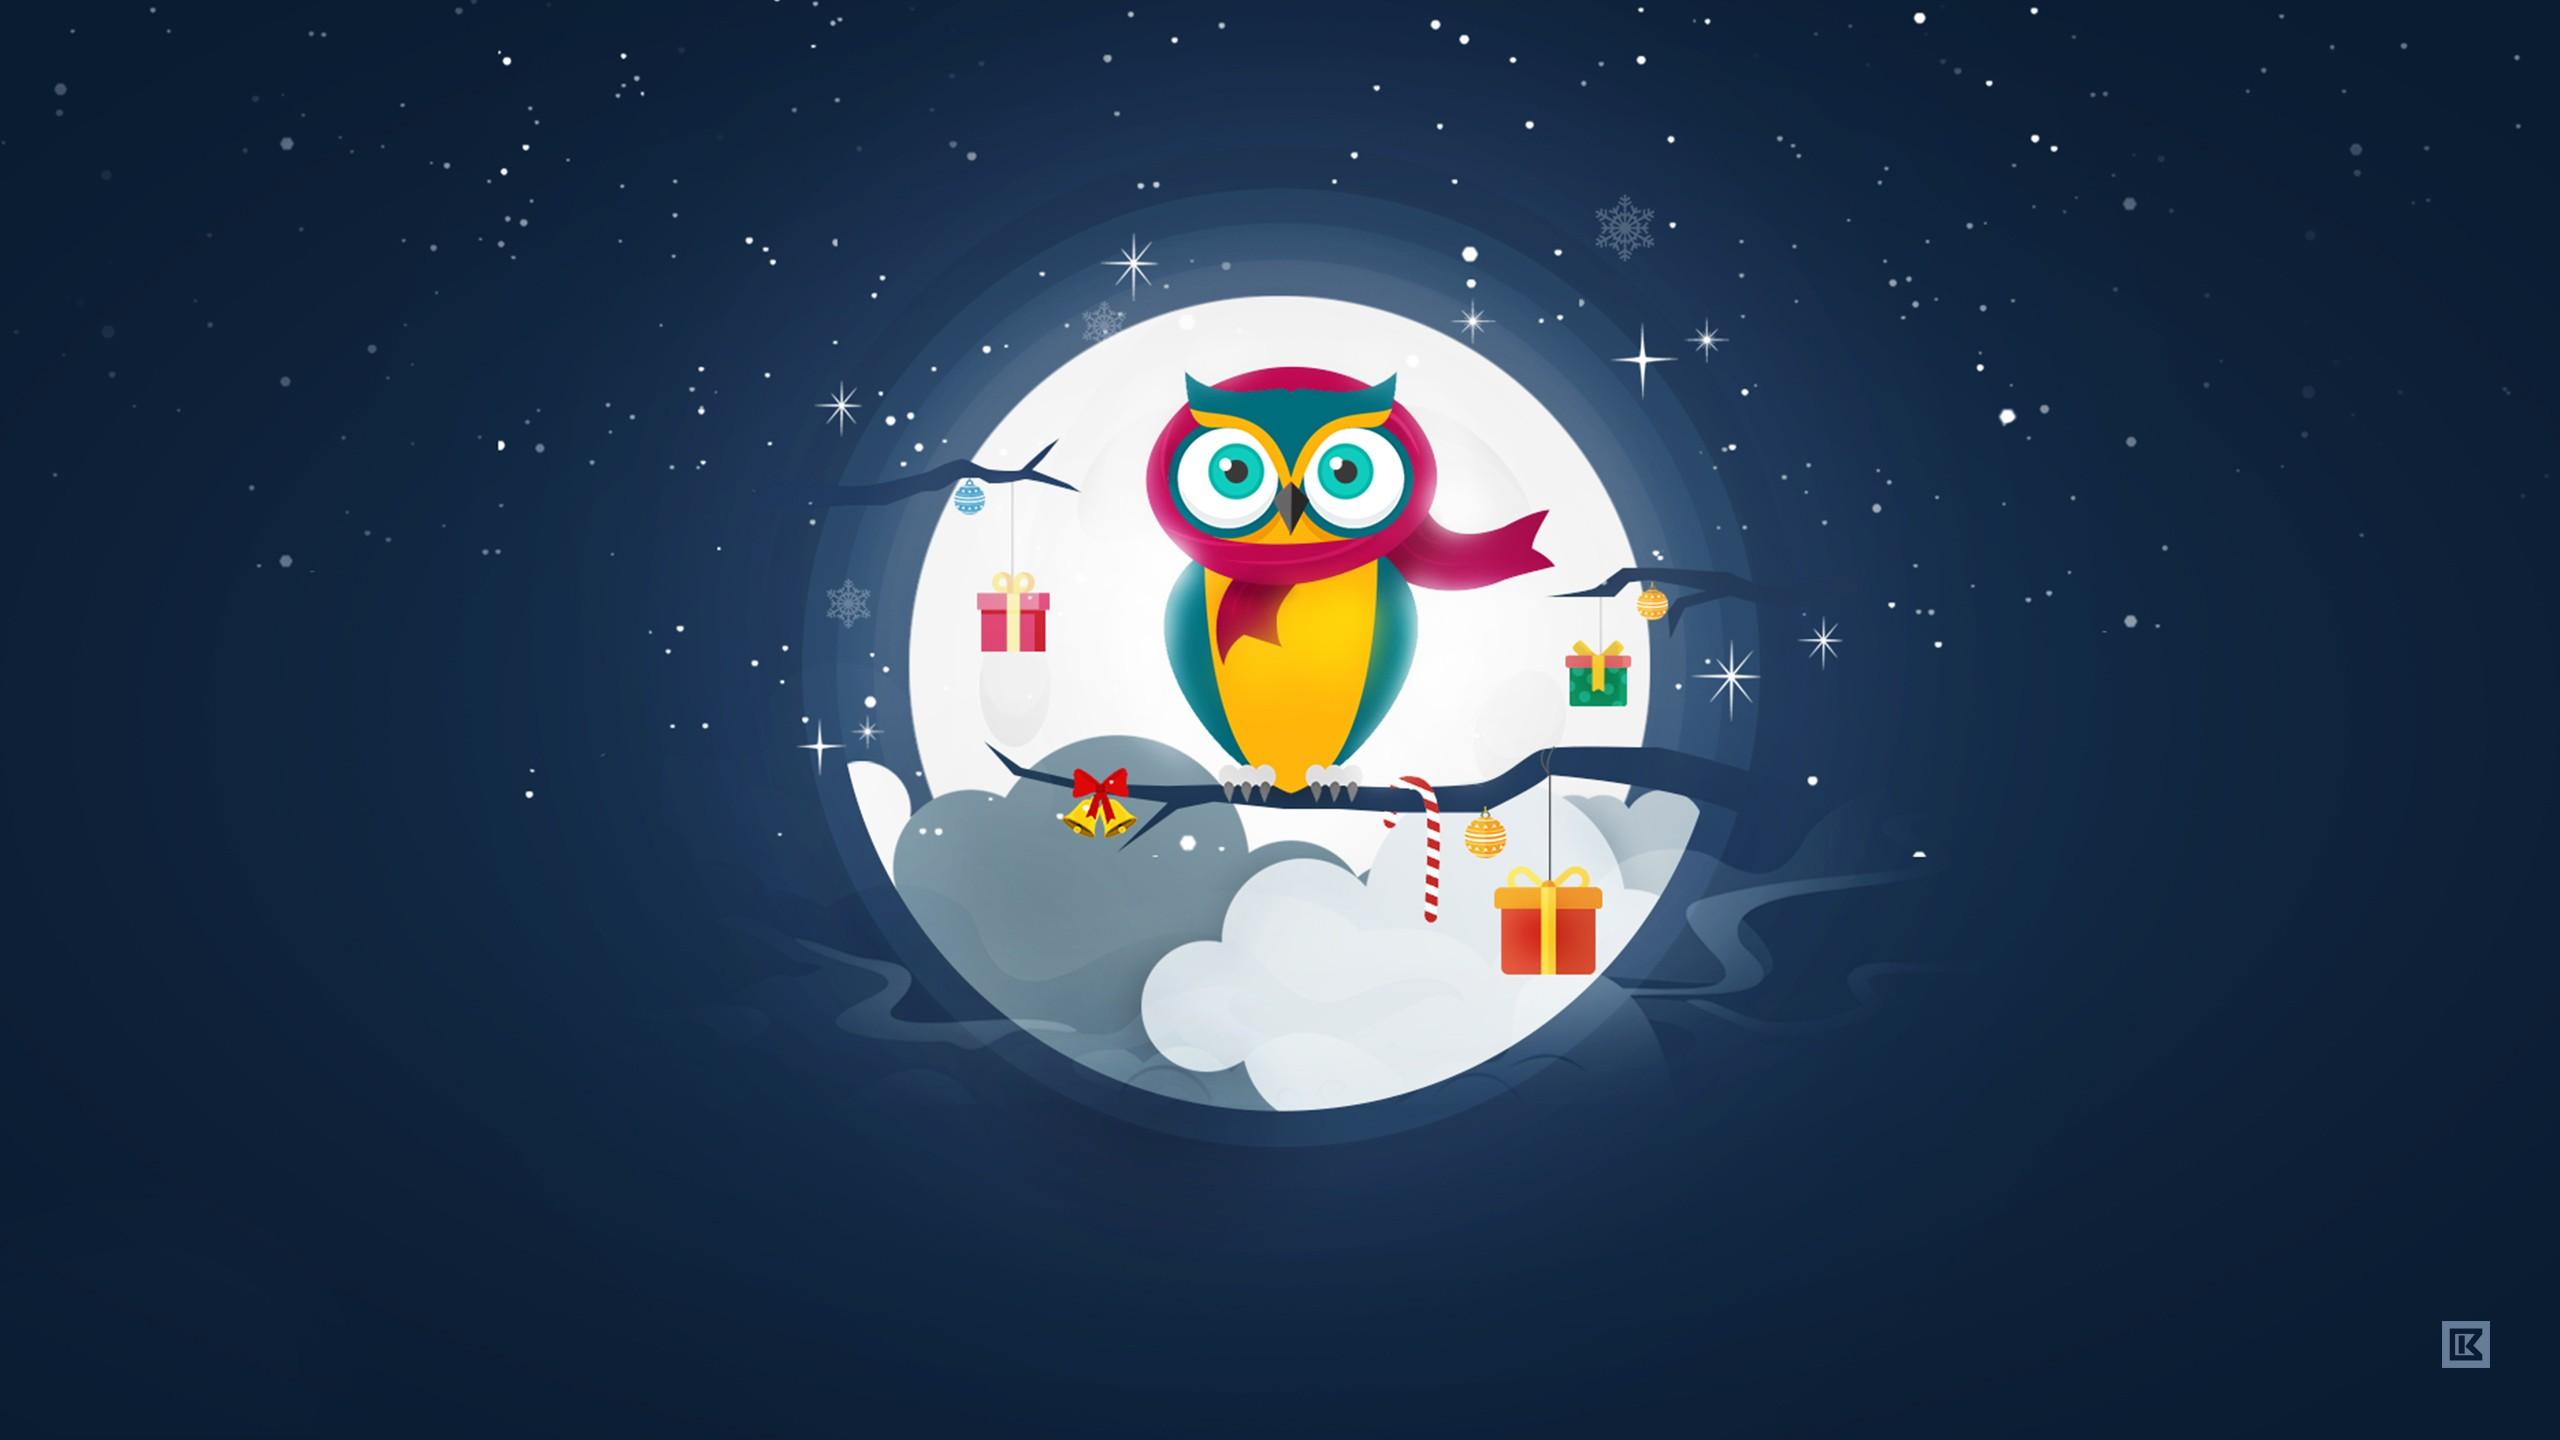 Cute Owl Cartoon Wallpaper Owl Christmas Winter Season Wallpapers Hd Wallpapers